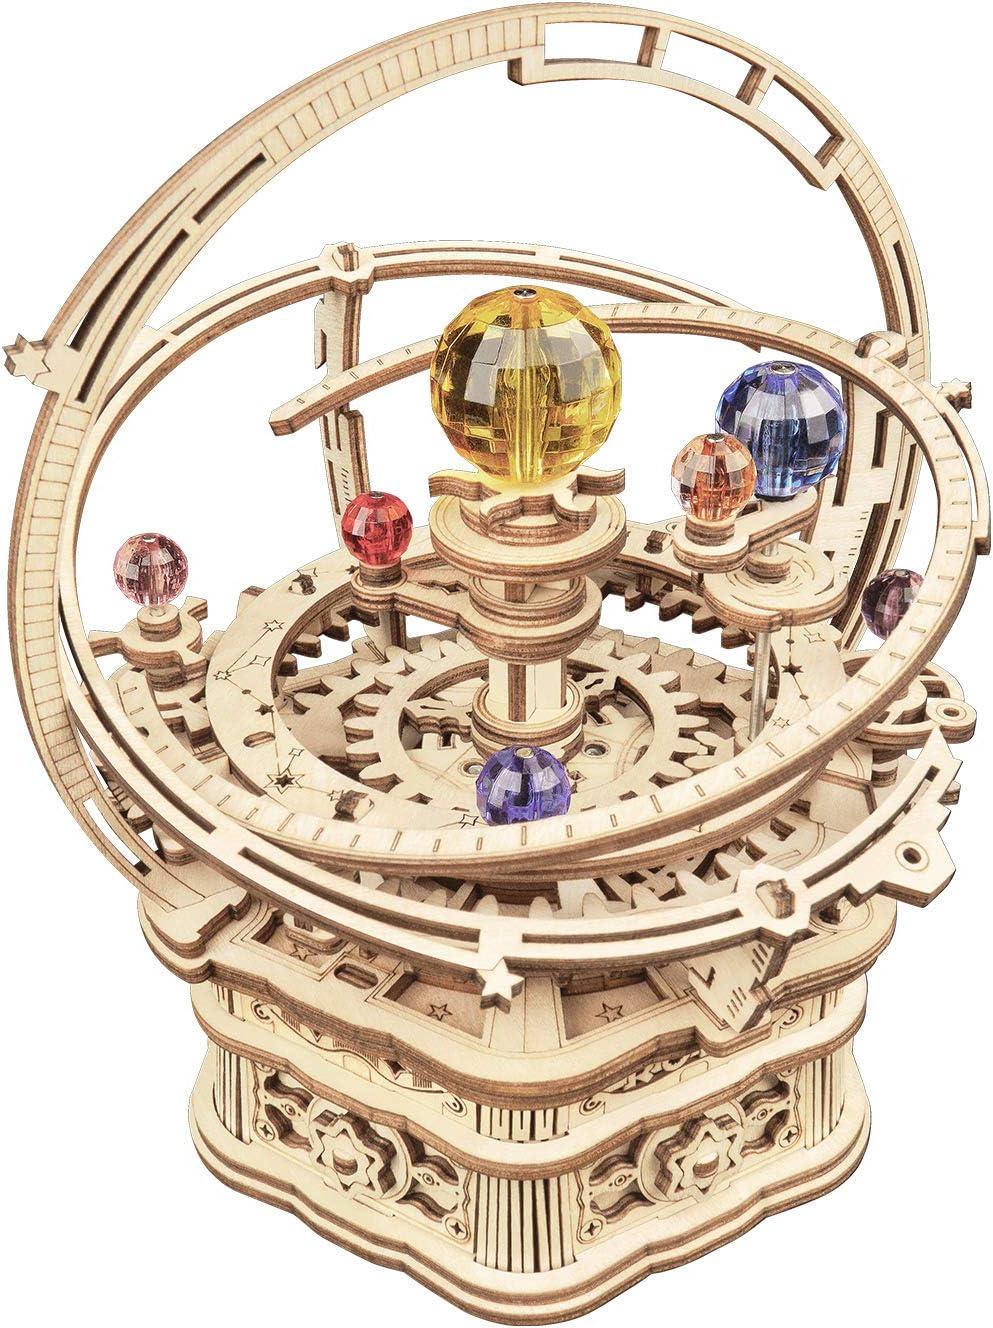 ROKR 3D Wooden Puzzles Model Kits Mechanical Music Box Victorian Lantern